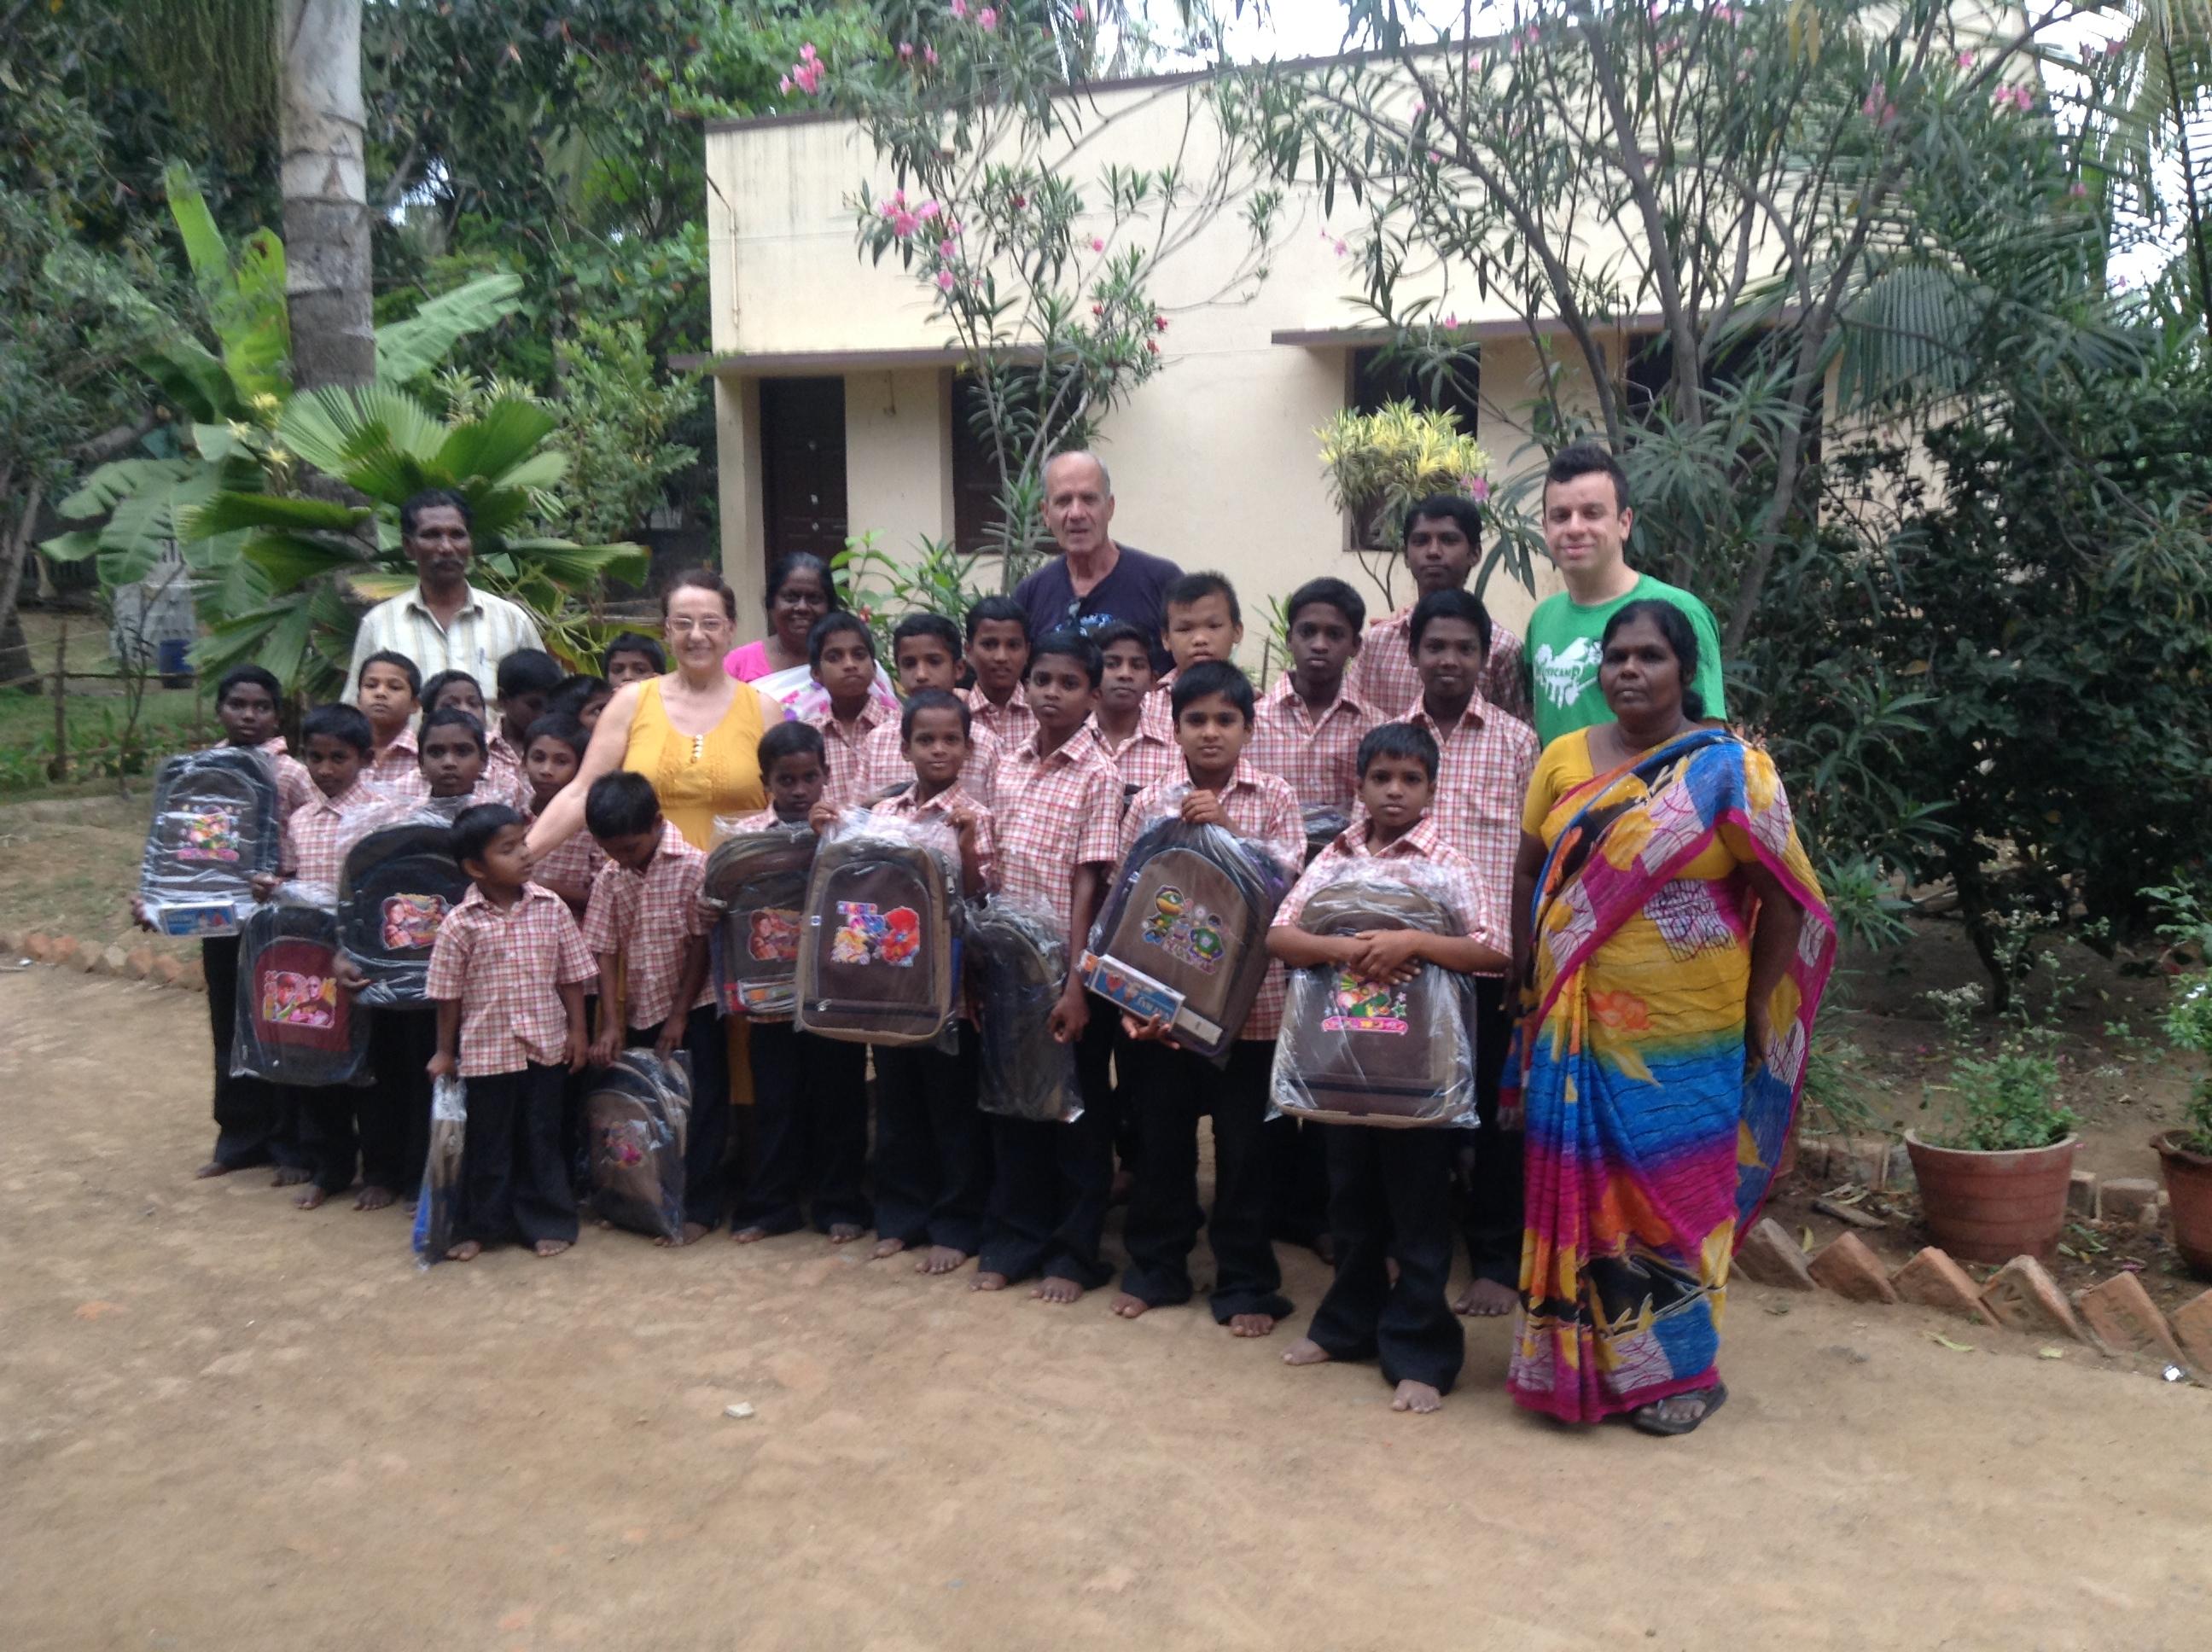 2018 Sostegno orfanotrofi in India